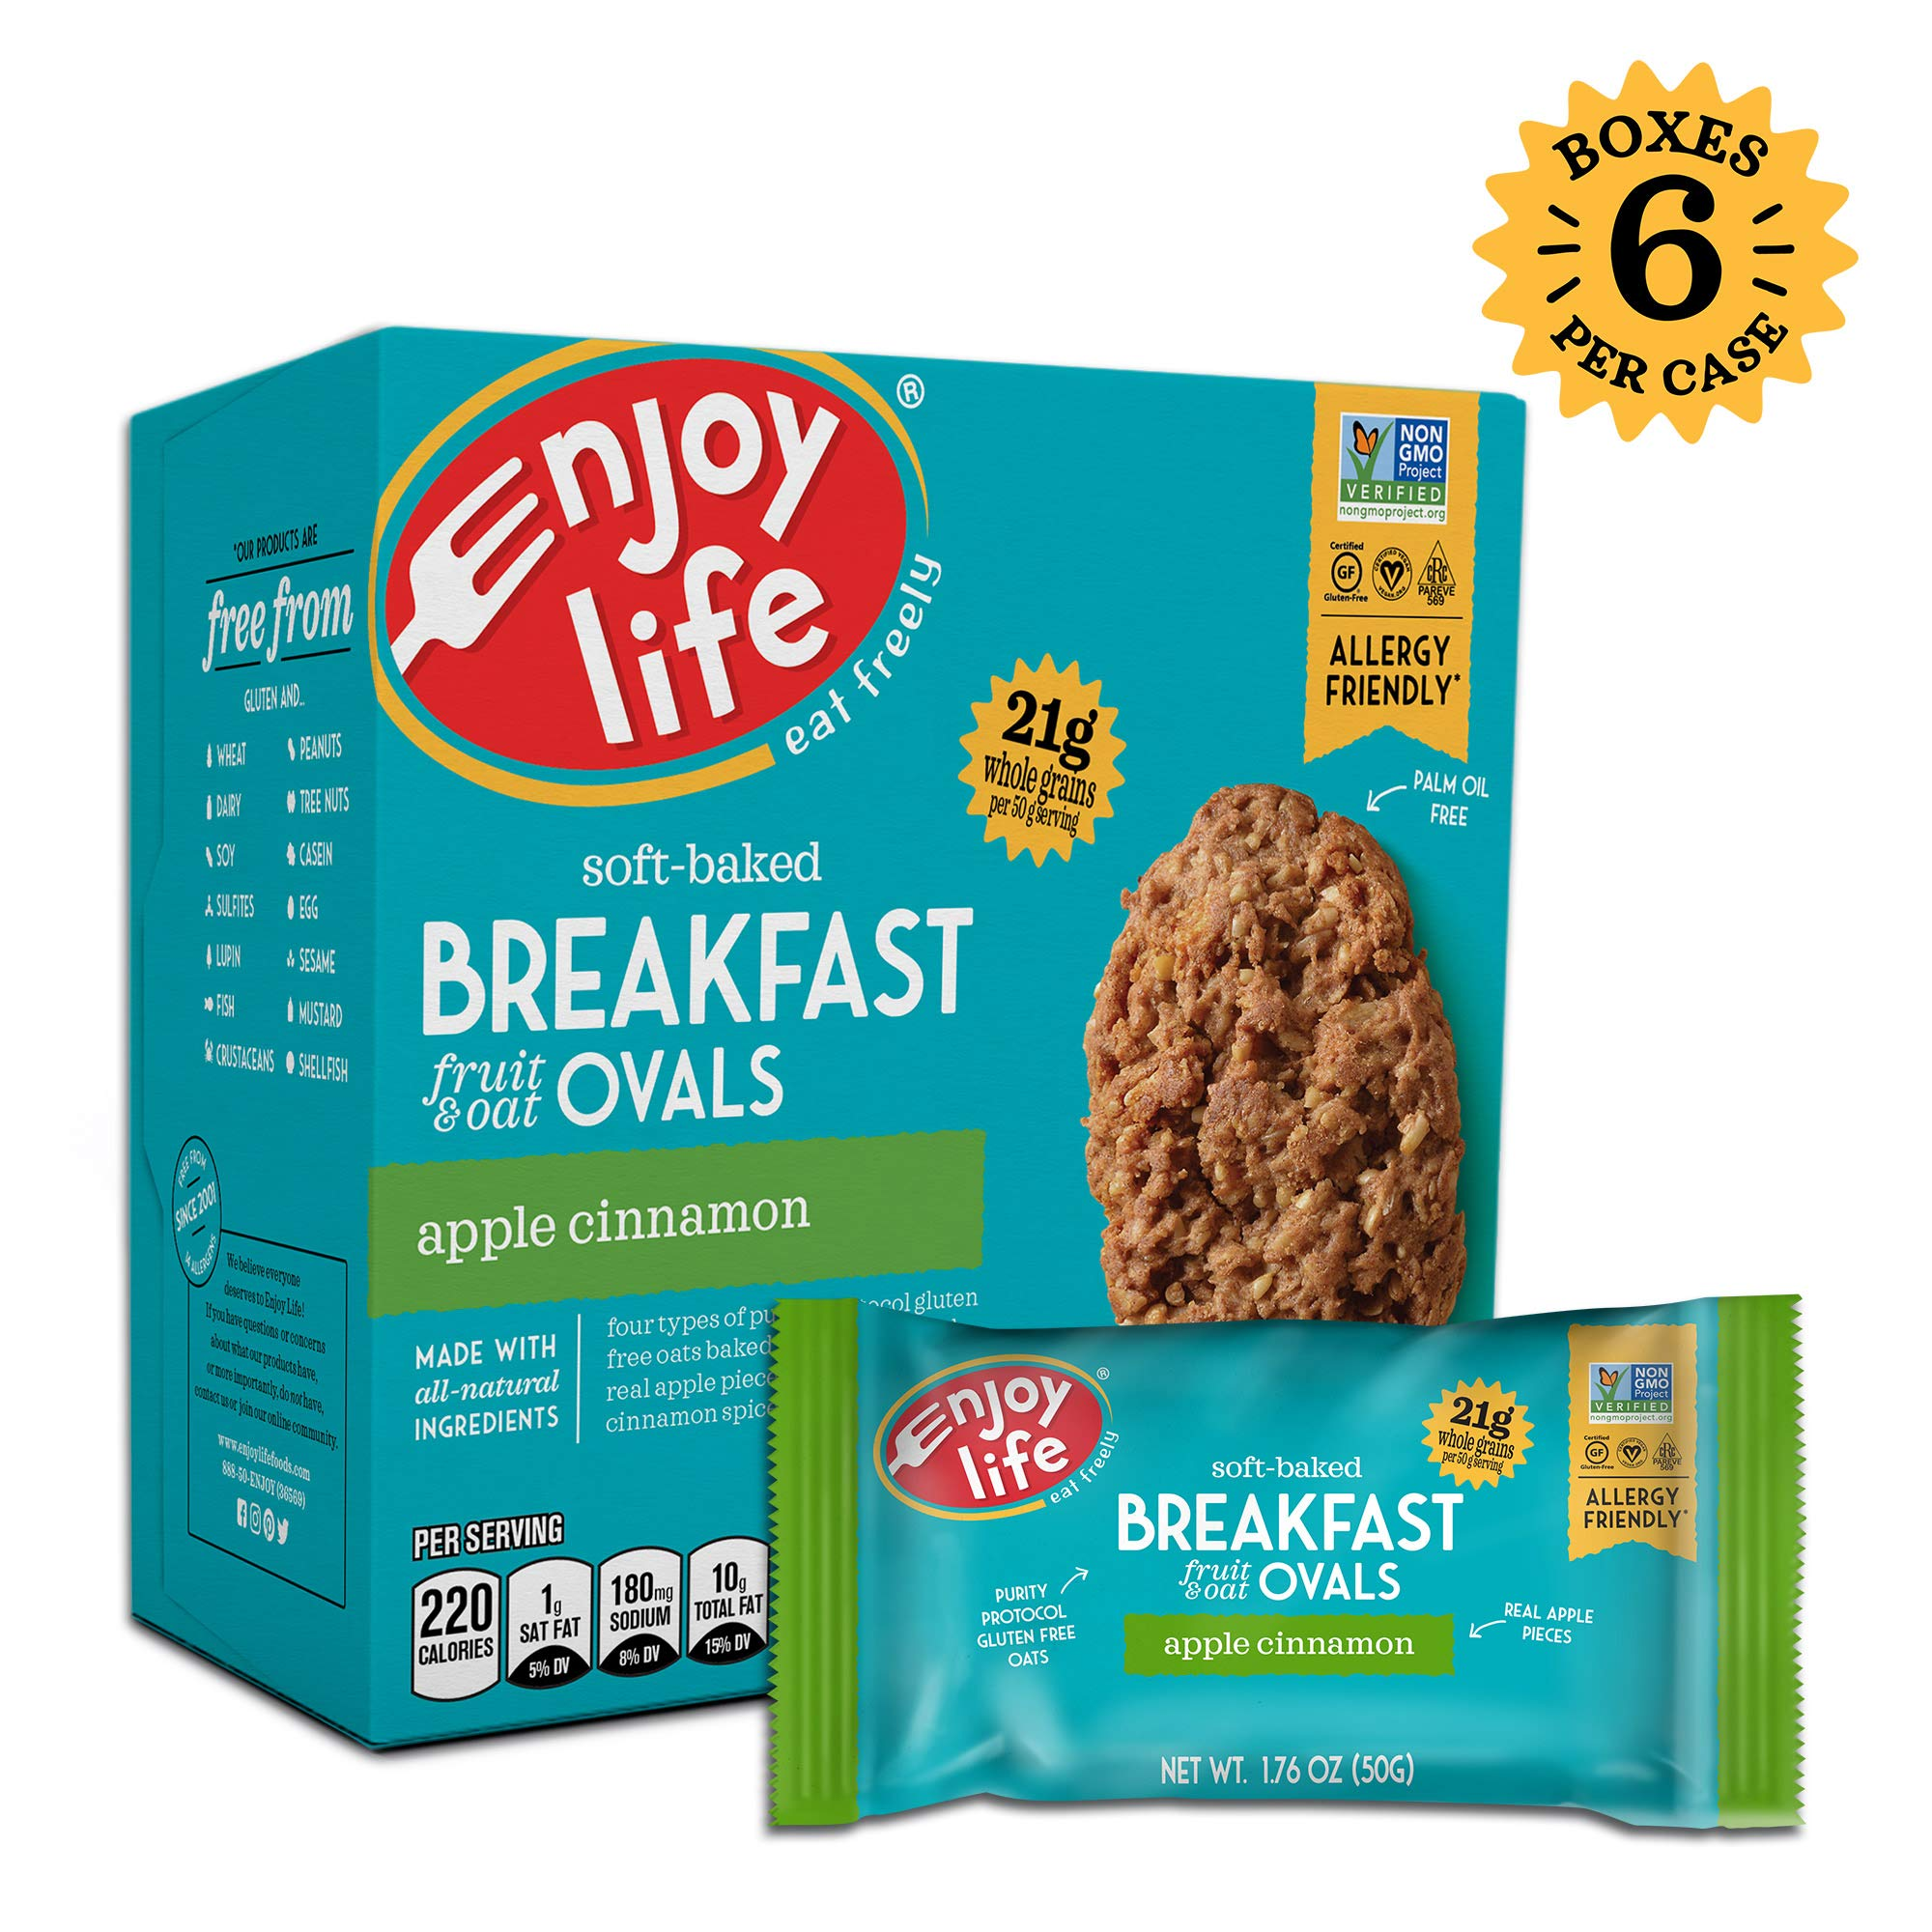 Enjoy Life Gluten Free Nut Free & Vegan Breakfast Cookies, Apple Cinnamon, 6 Count Boxes, 30 Bars by Enjoy Life Foods